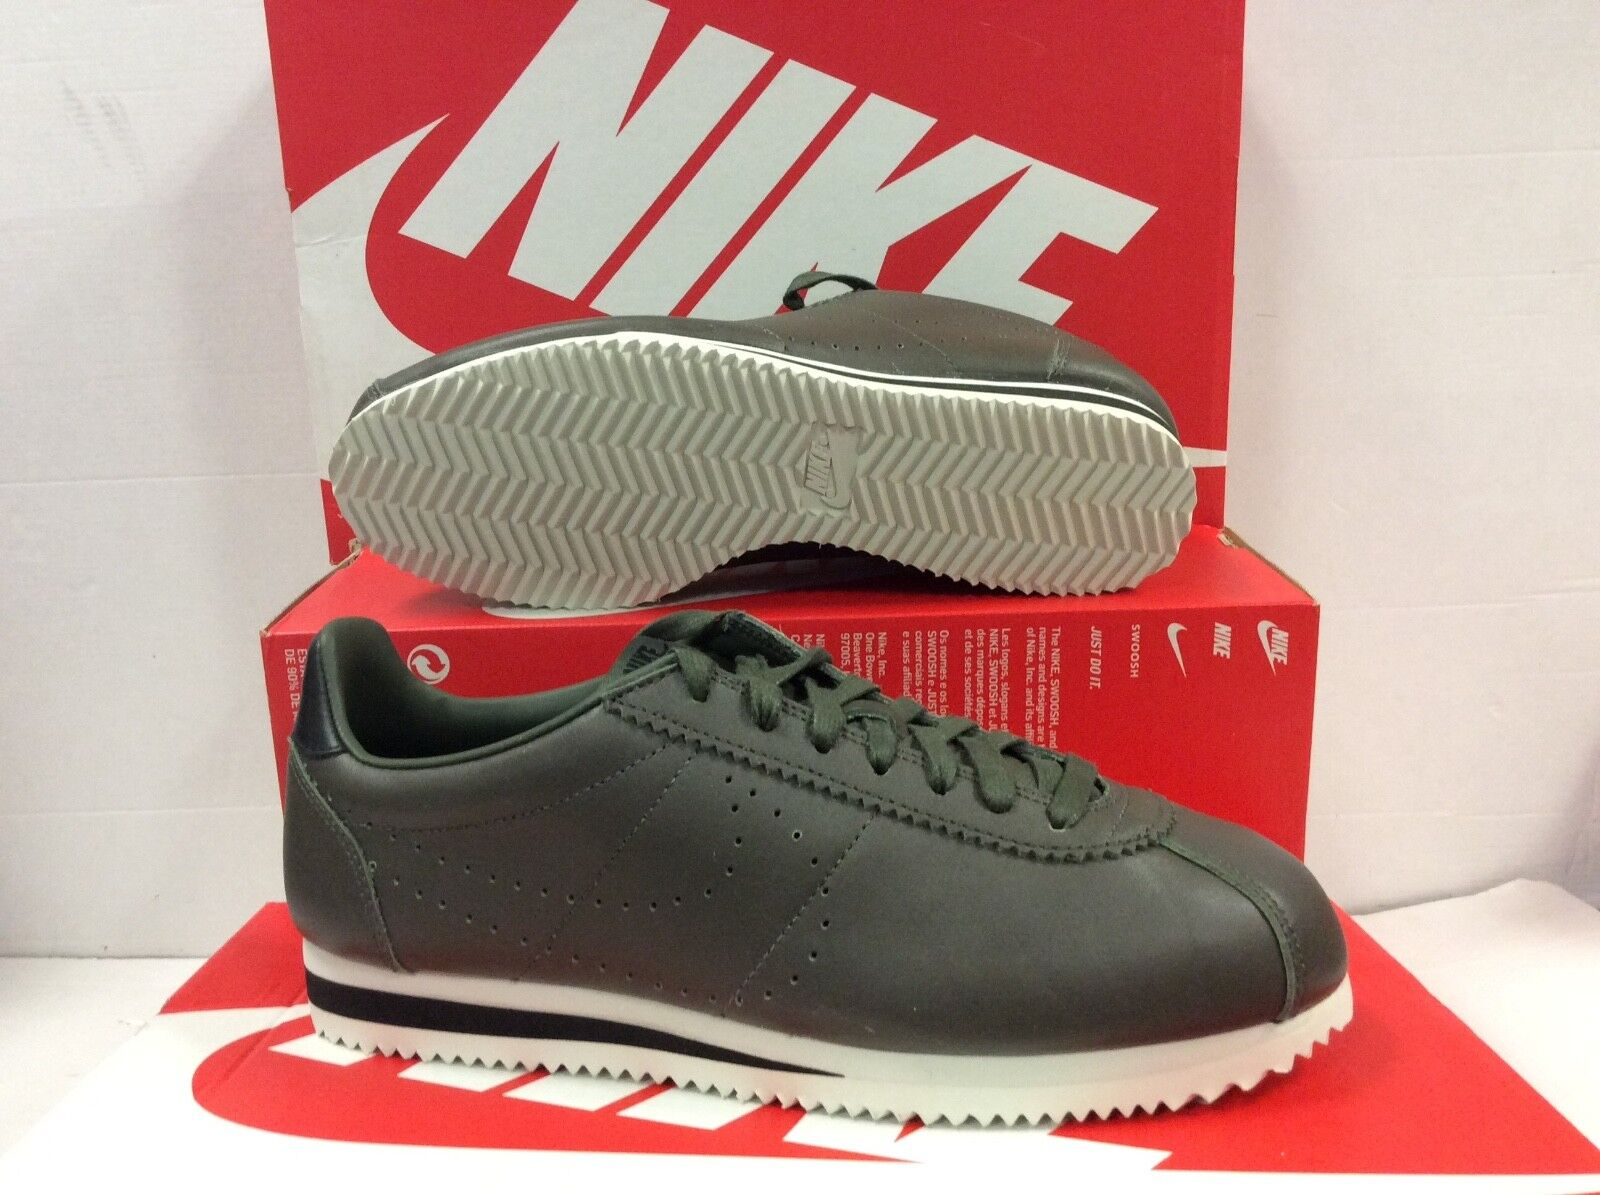 Nike Classic Cortez Premium in Pelle Uomo Uomo Uomo Scarpe da ginnastica, Taglia /EUR 46 db057d